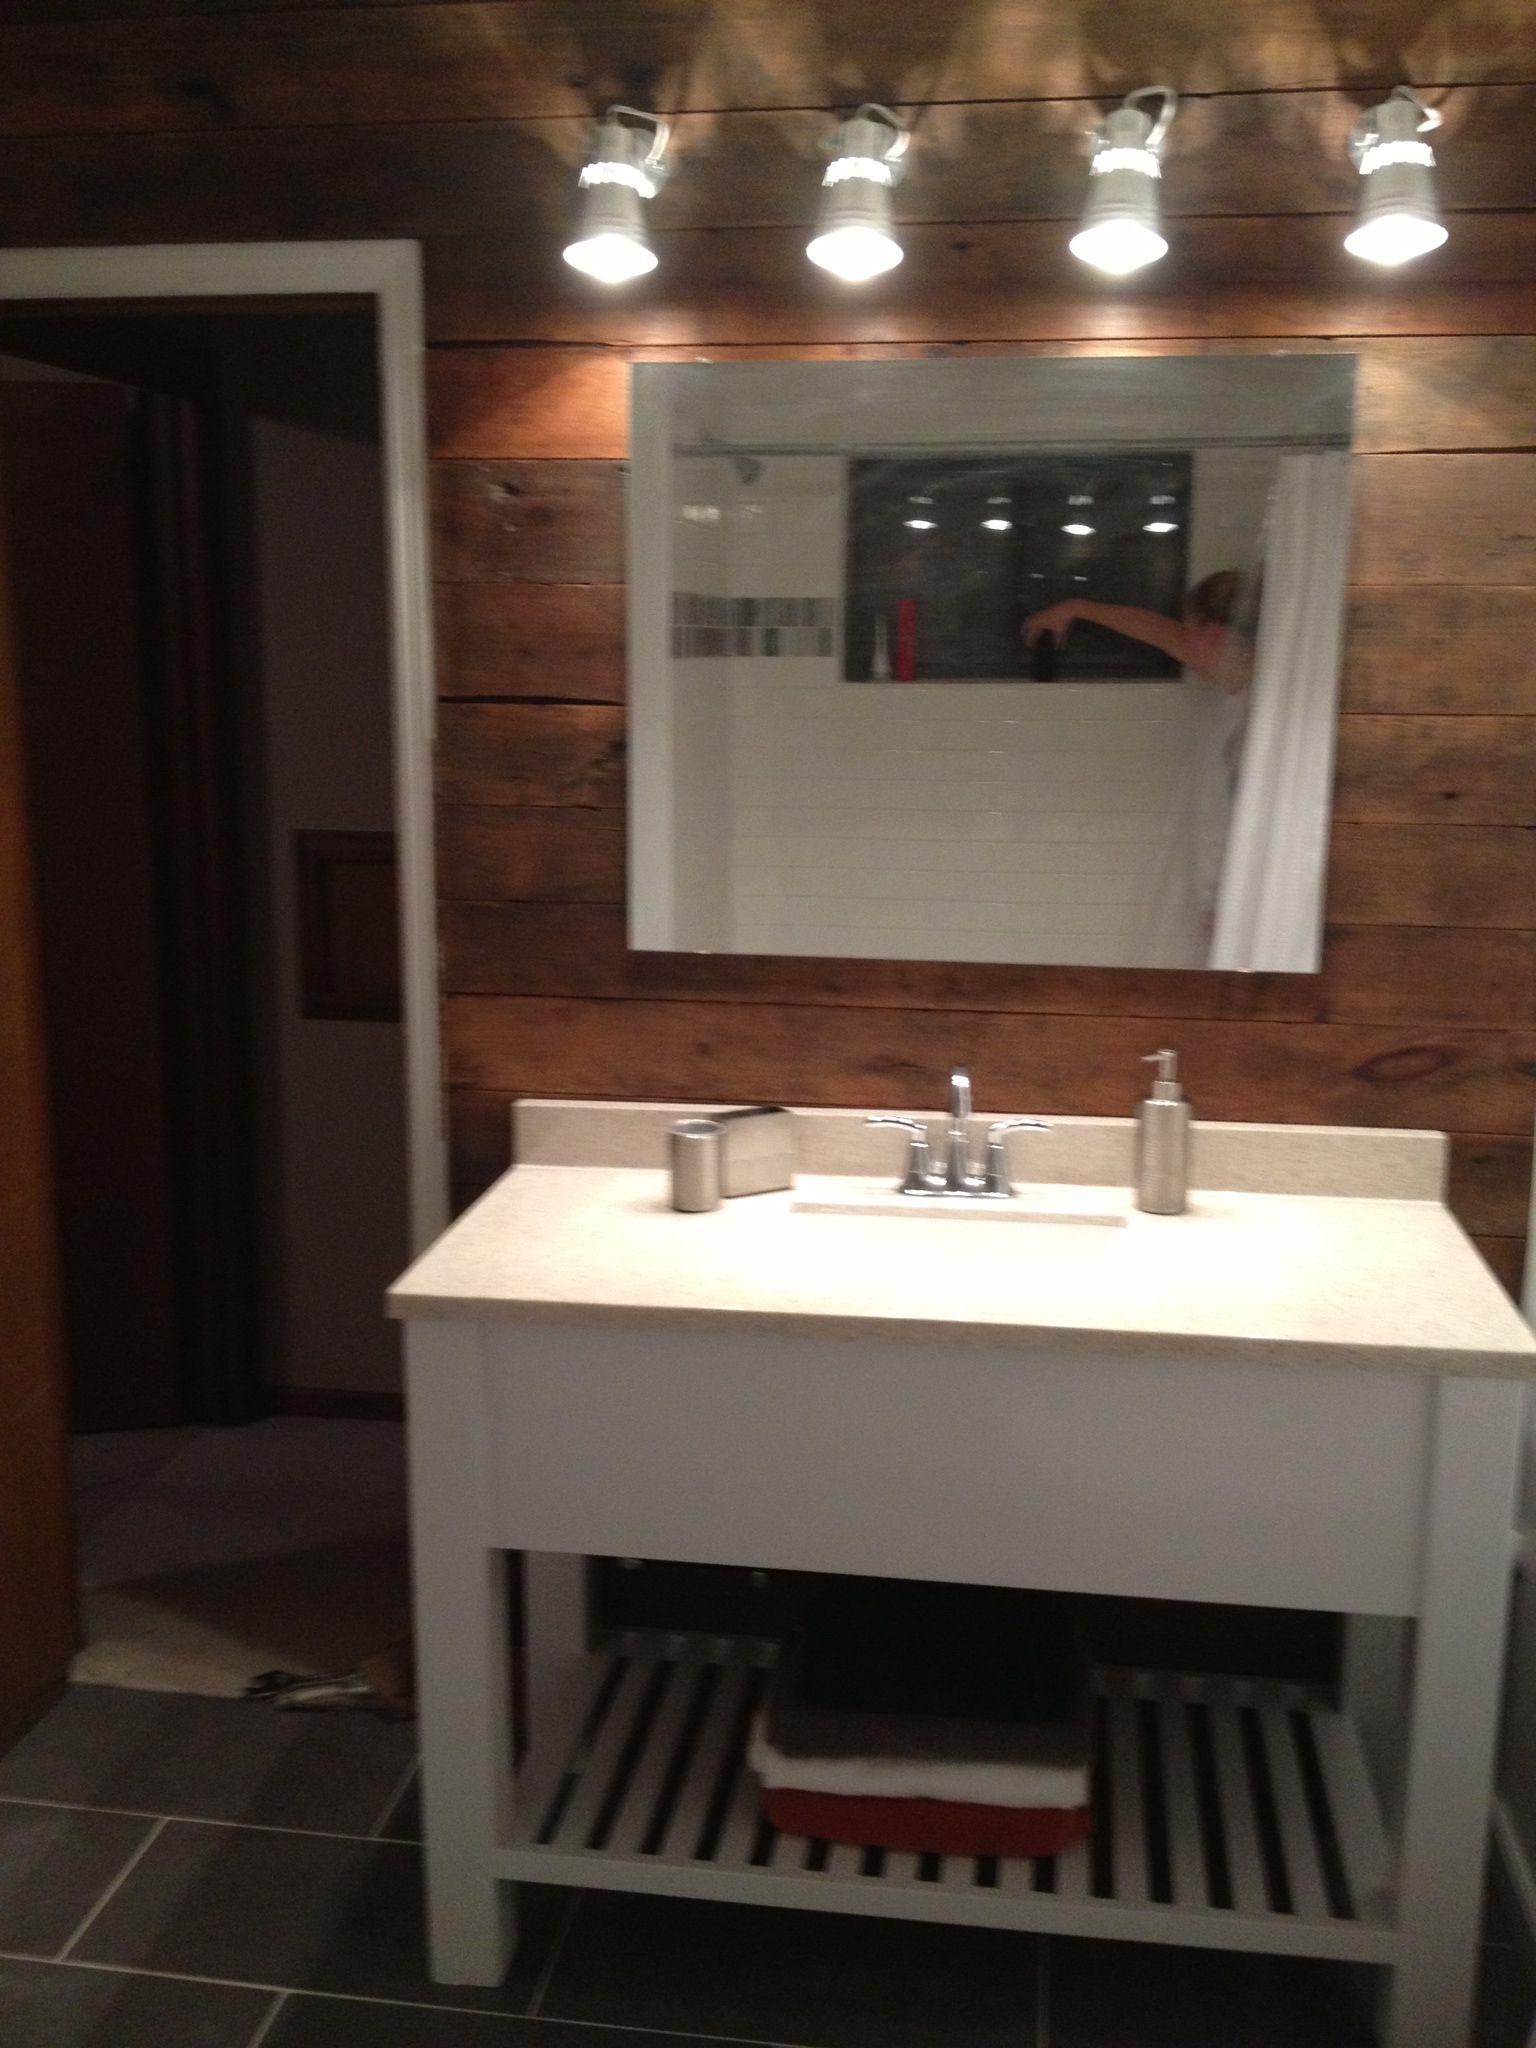 Best Bath Vanity Barn Wood Wall Ikea Lights White Modern 400 x 300